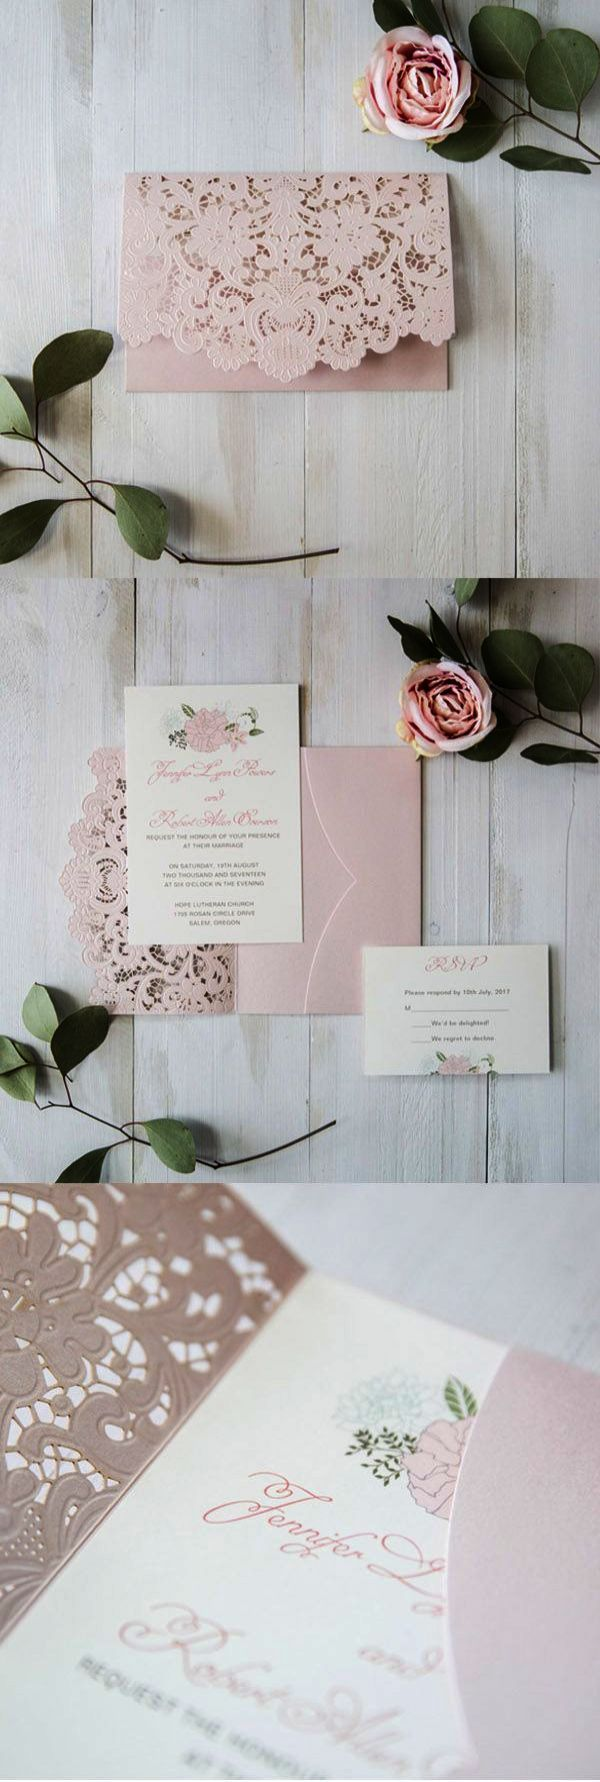 Now thatu0027s sweet u003e DIY Wedding Invitation